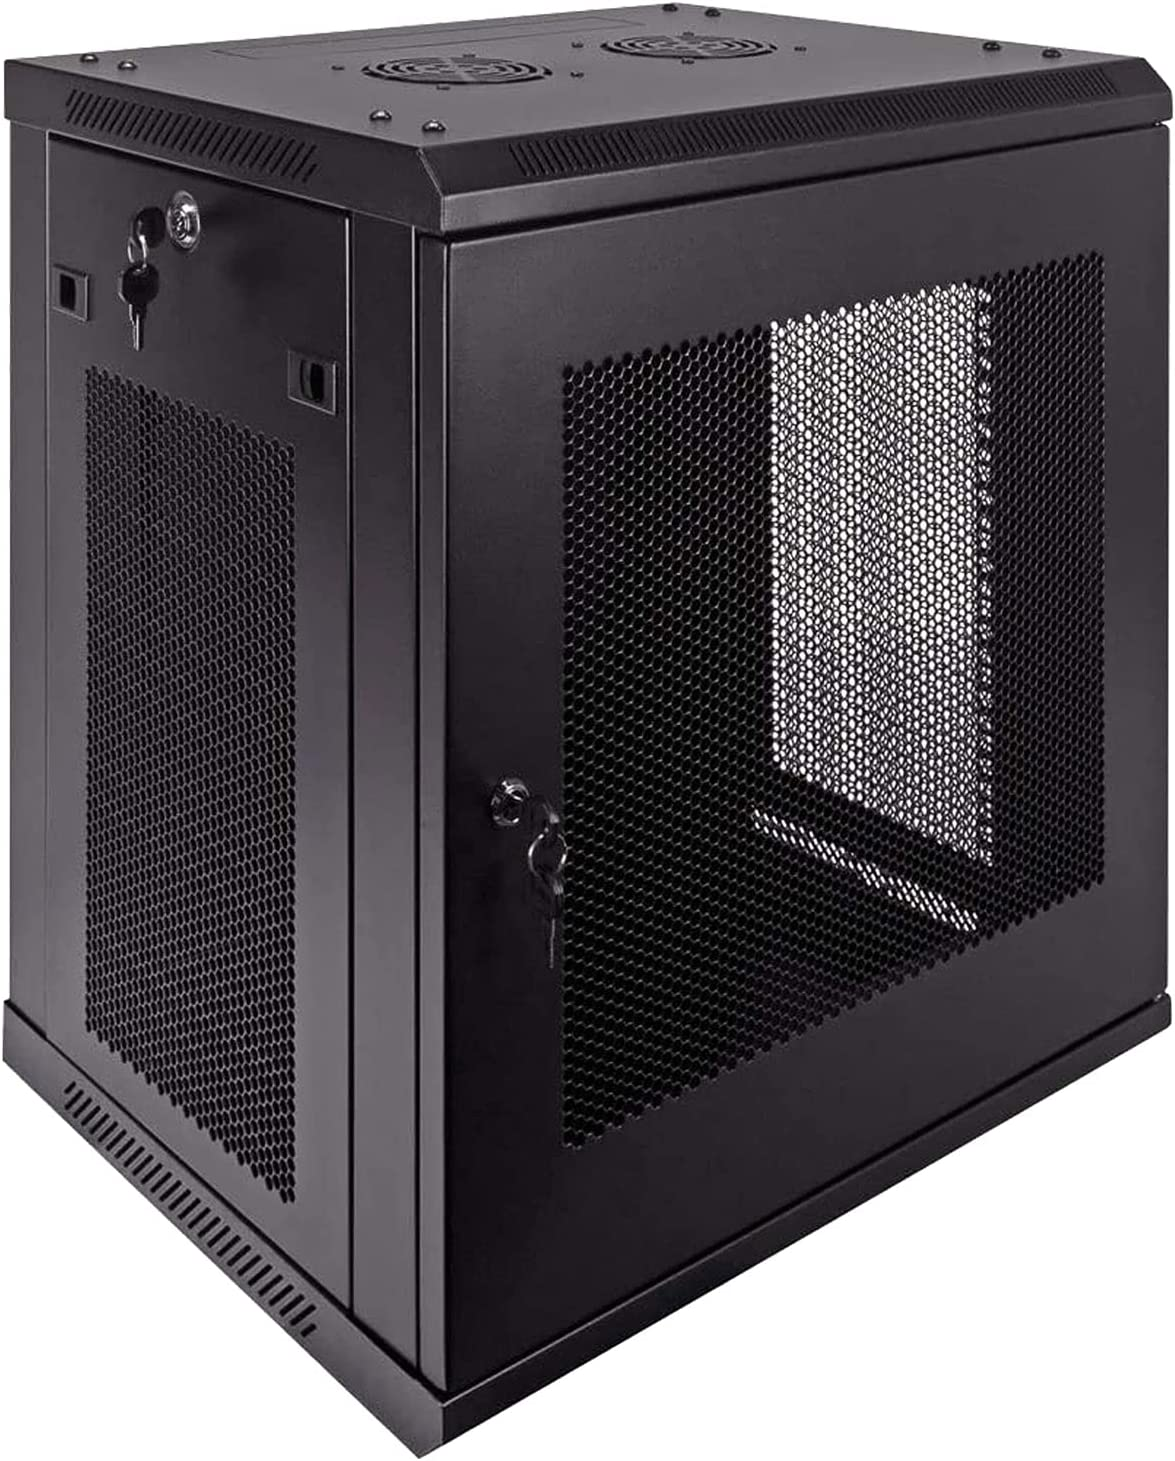 12U Deluxe IT Wallmount Cabinet Enclosure 19-Inch Server Network Rack with Locking Perforated Door 16-Inches Deep Black,ApplytoNetworkWiringRoom,ComputerRoom,Office,etc.SoldbyFerruNet